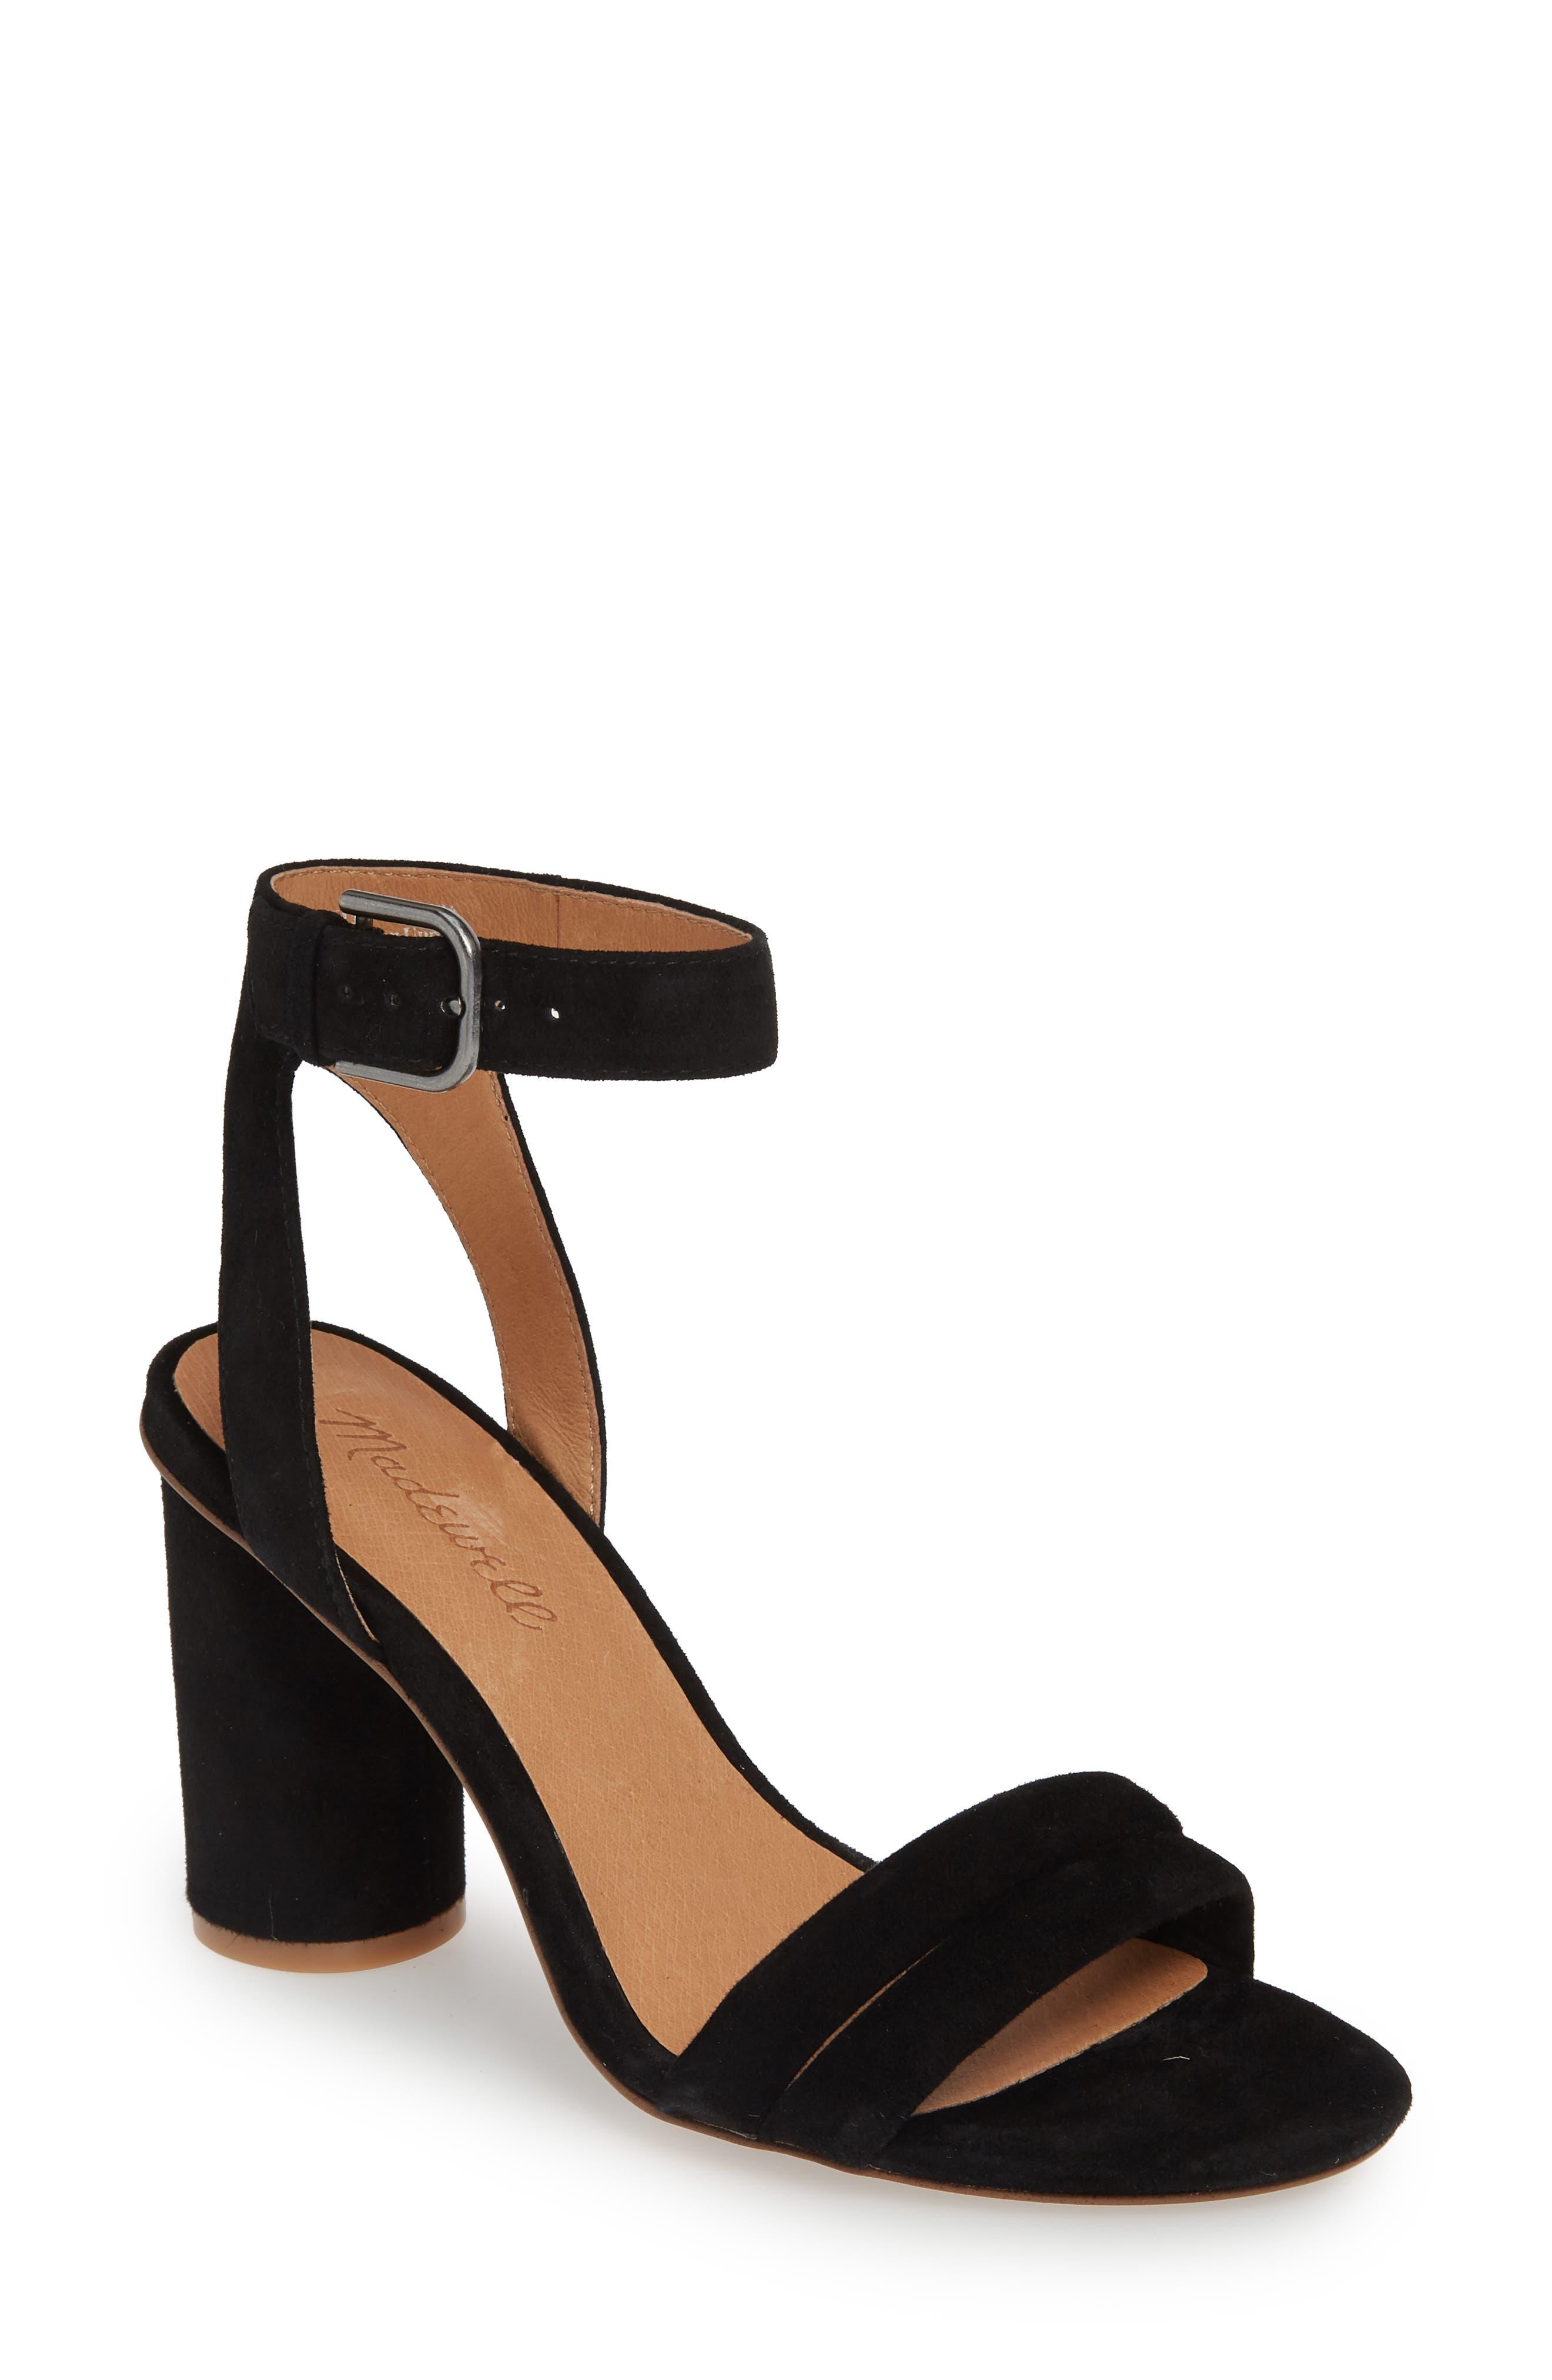 Madewell The Rosalie High Heel Sandal, Black